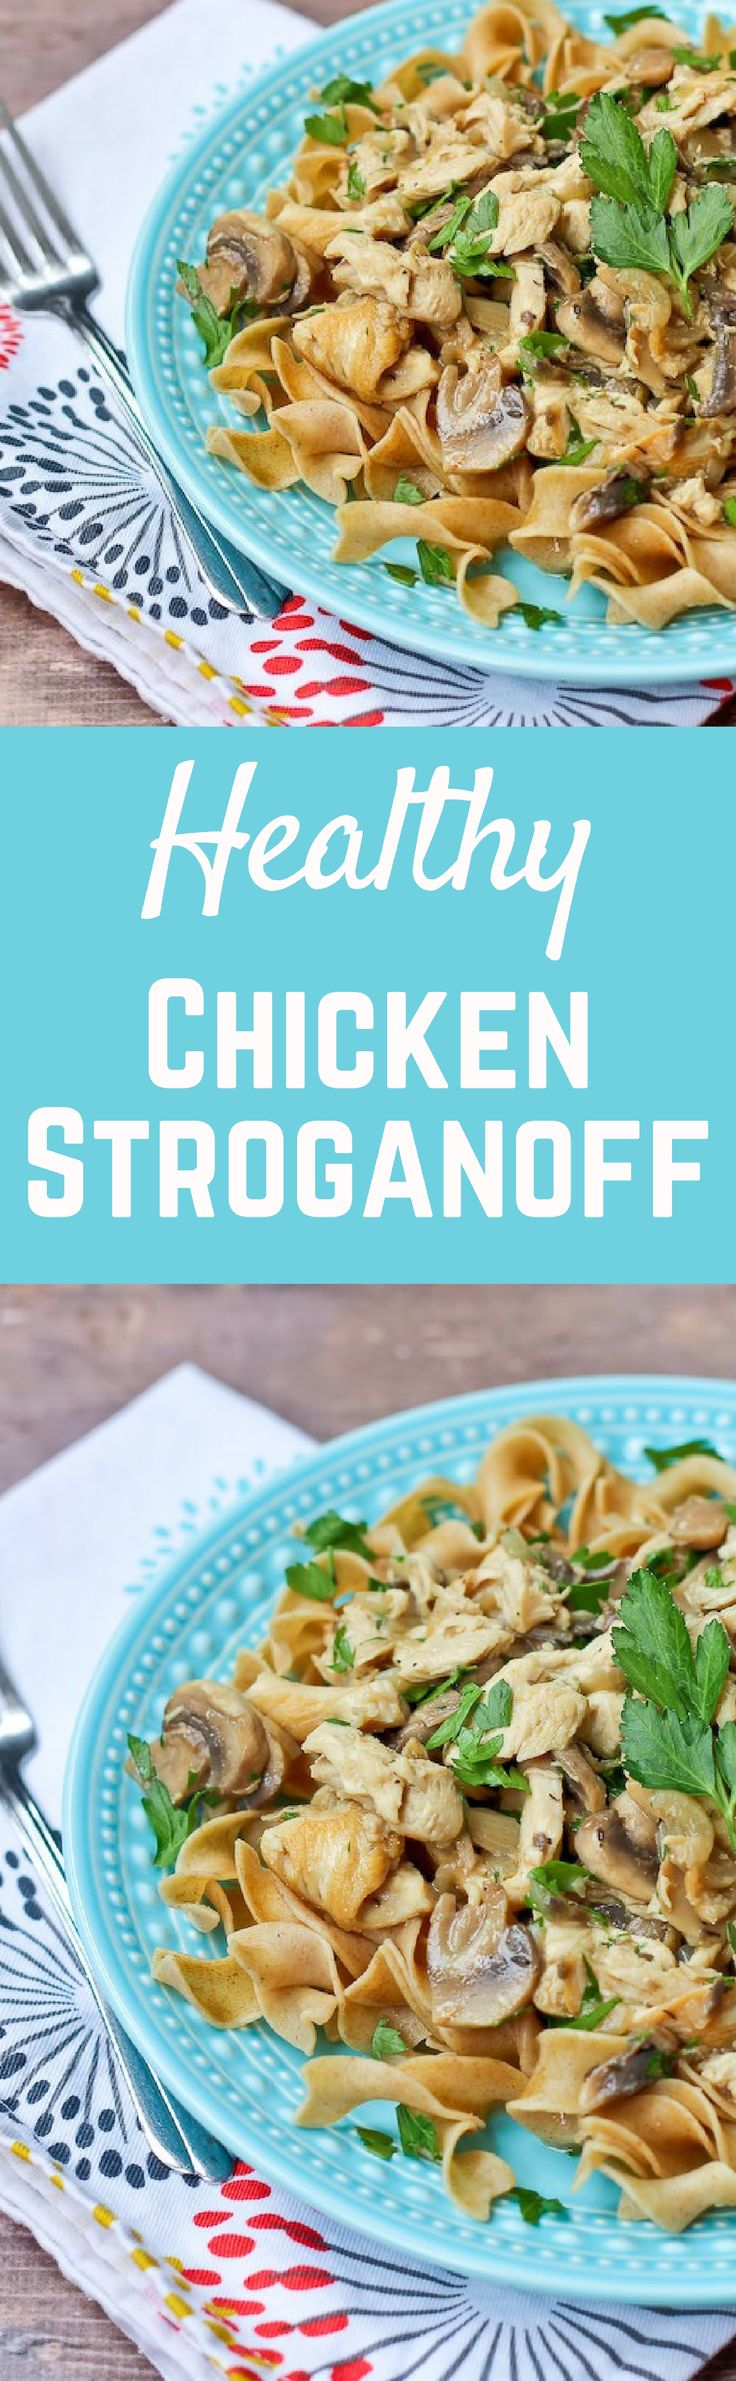 Healthy Chicken Stroganoff - get the 30 minute recipe on RachelCooks.com: